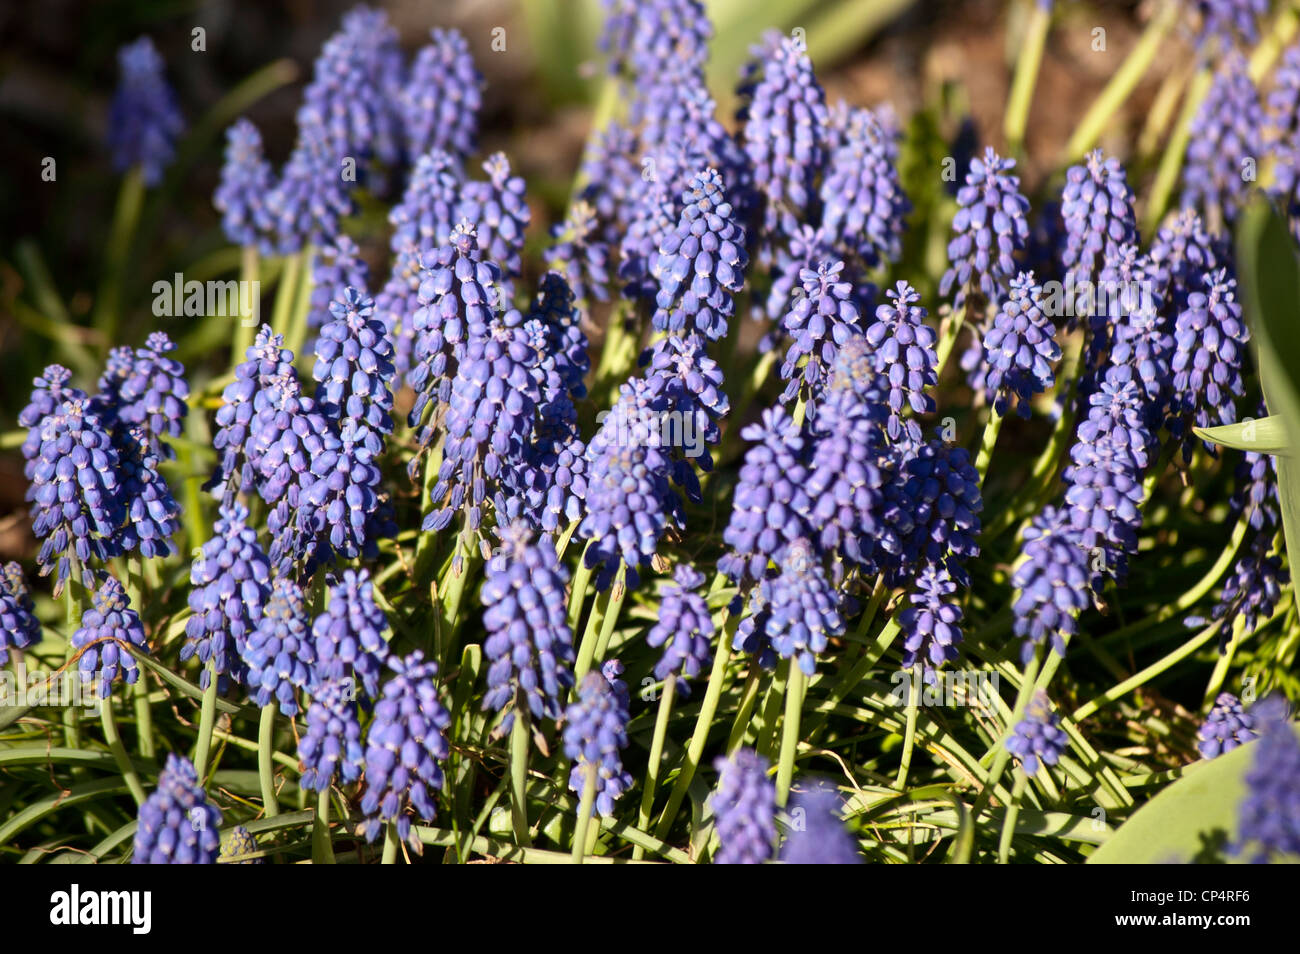 Many Blue Spring Flowers Of Muscari Babys Breath Grape Hyacinth